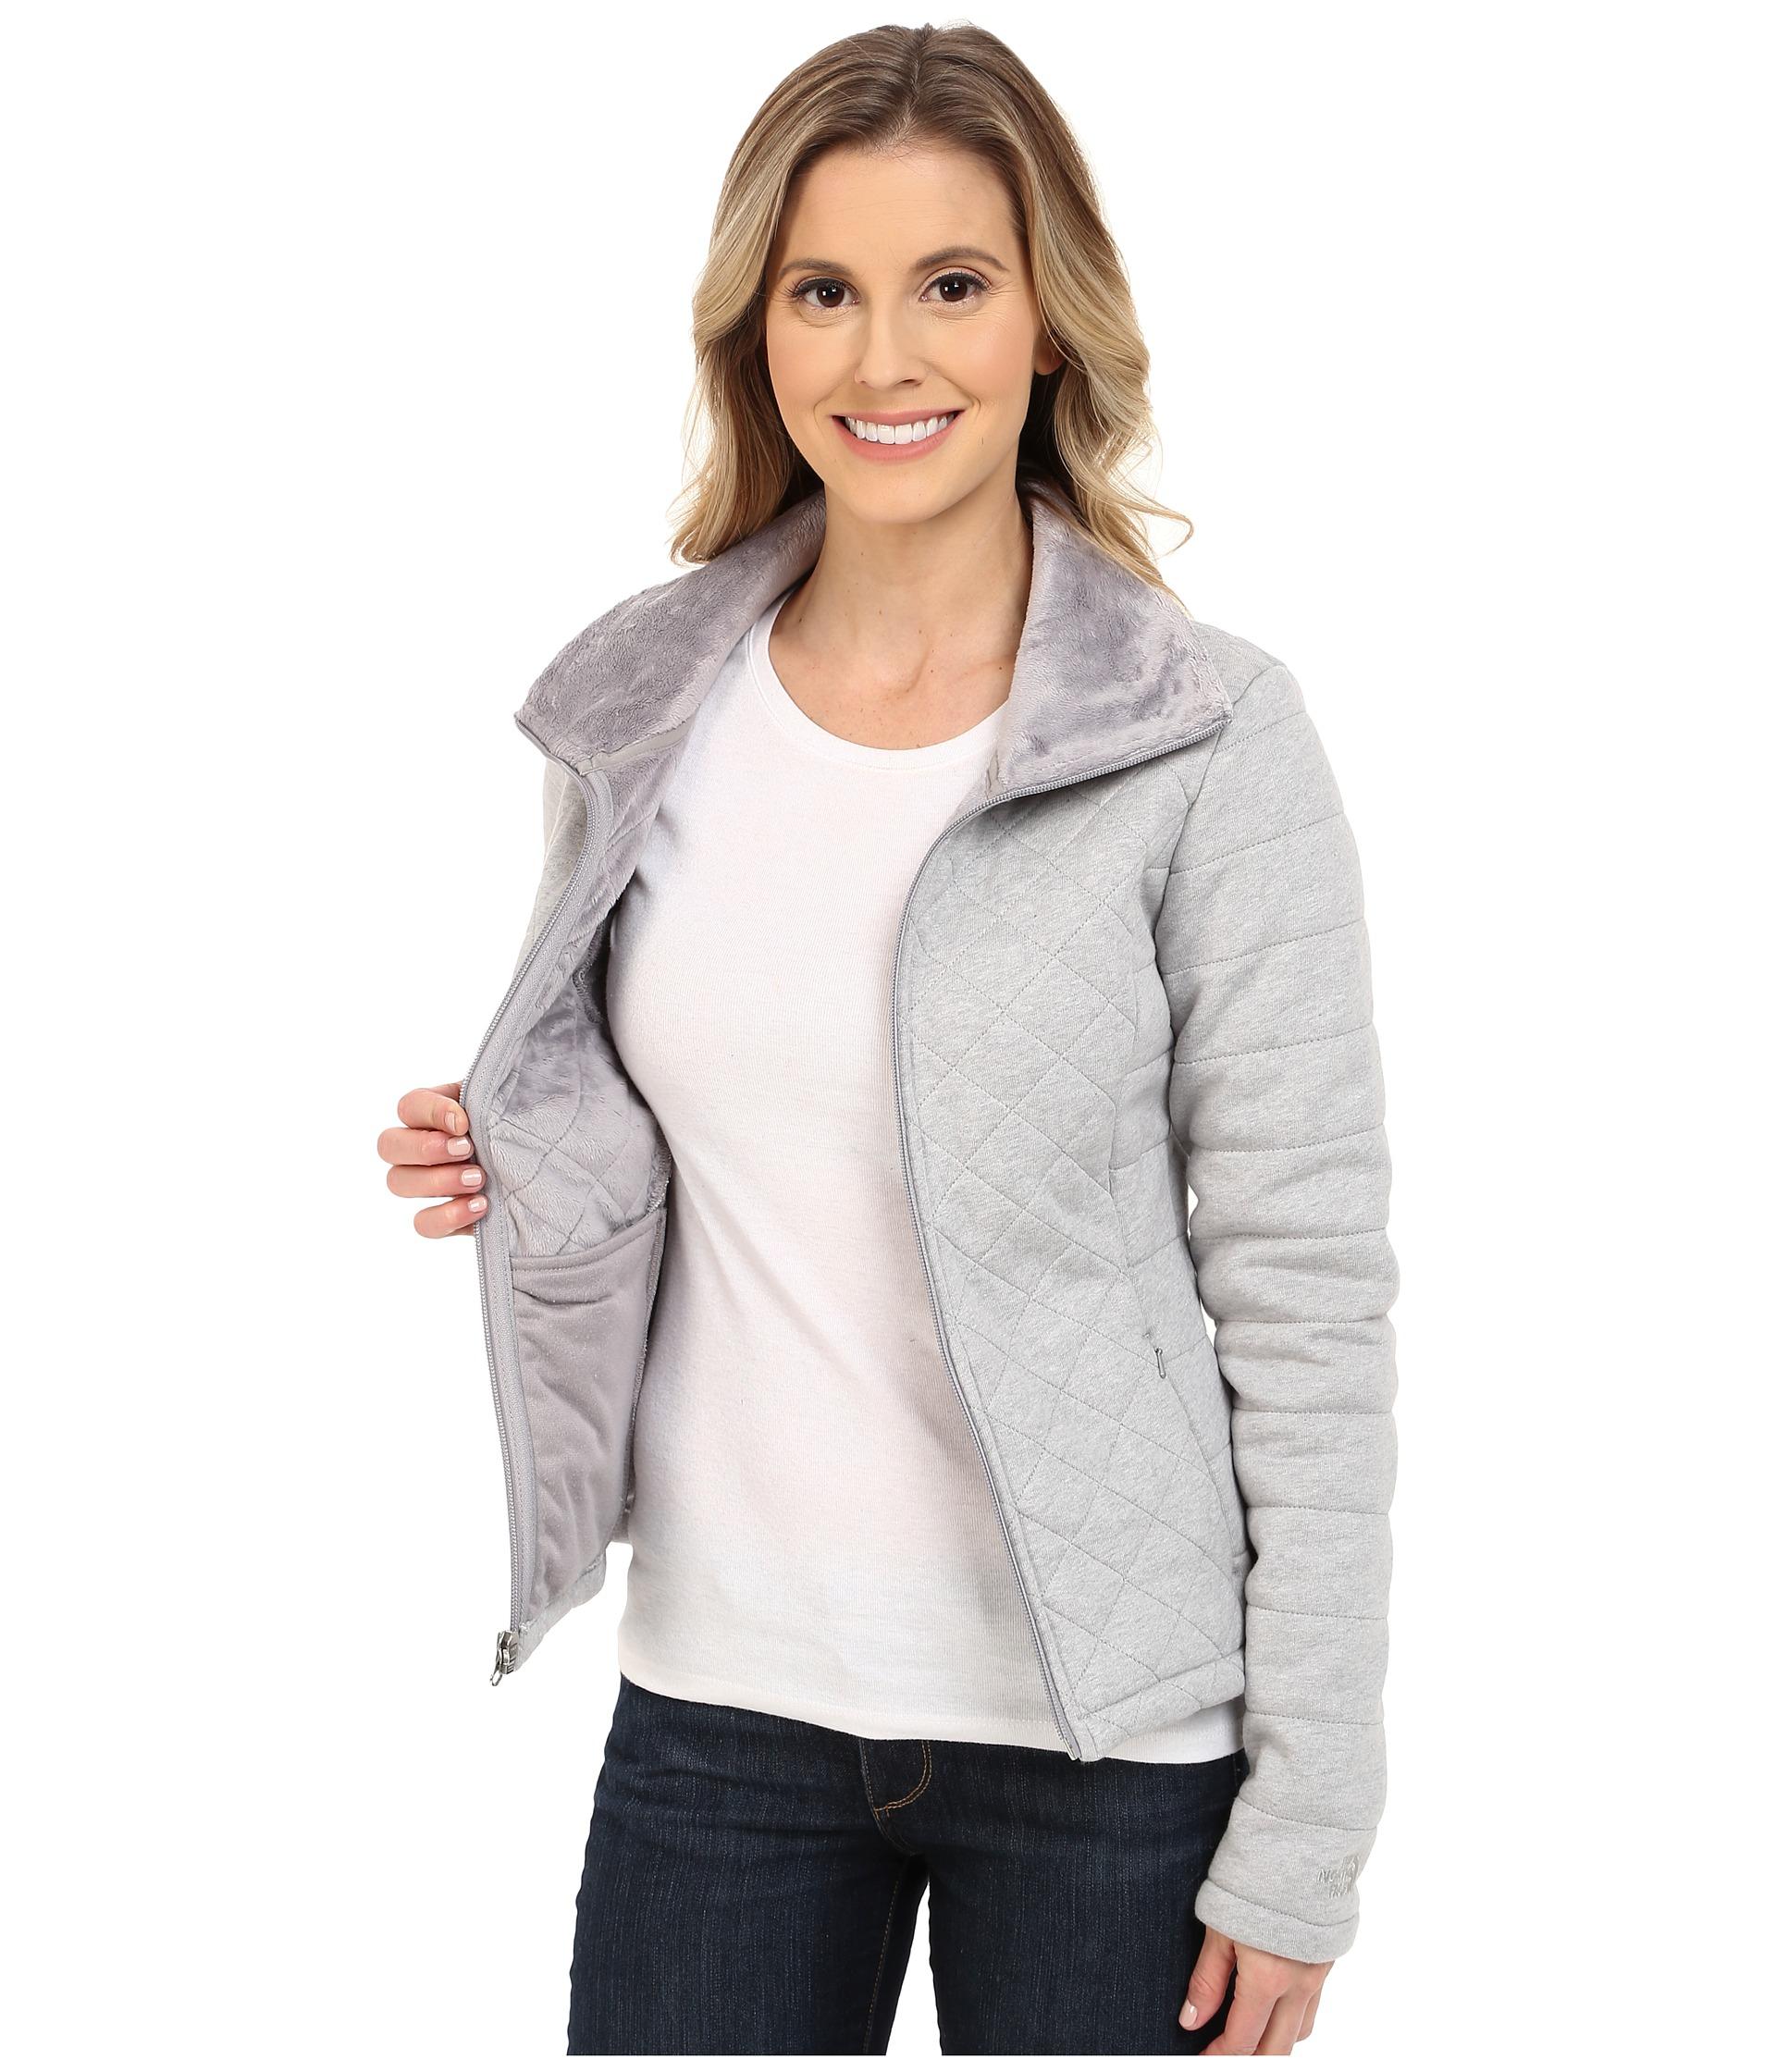 e437f10ce Women's Gray Caroluna Crop Jacket